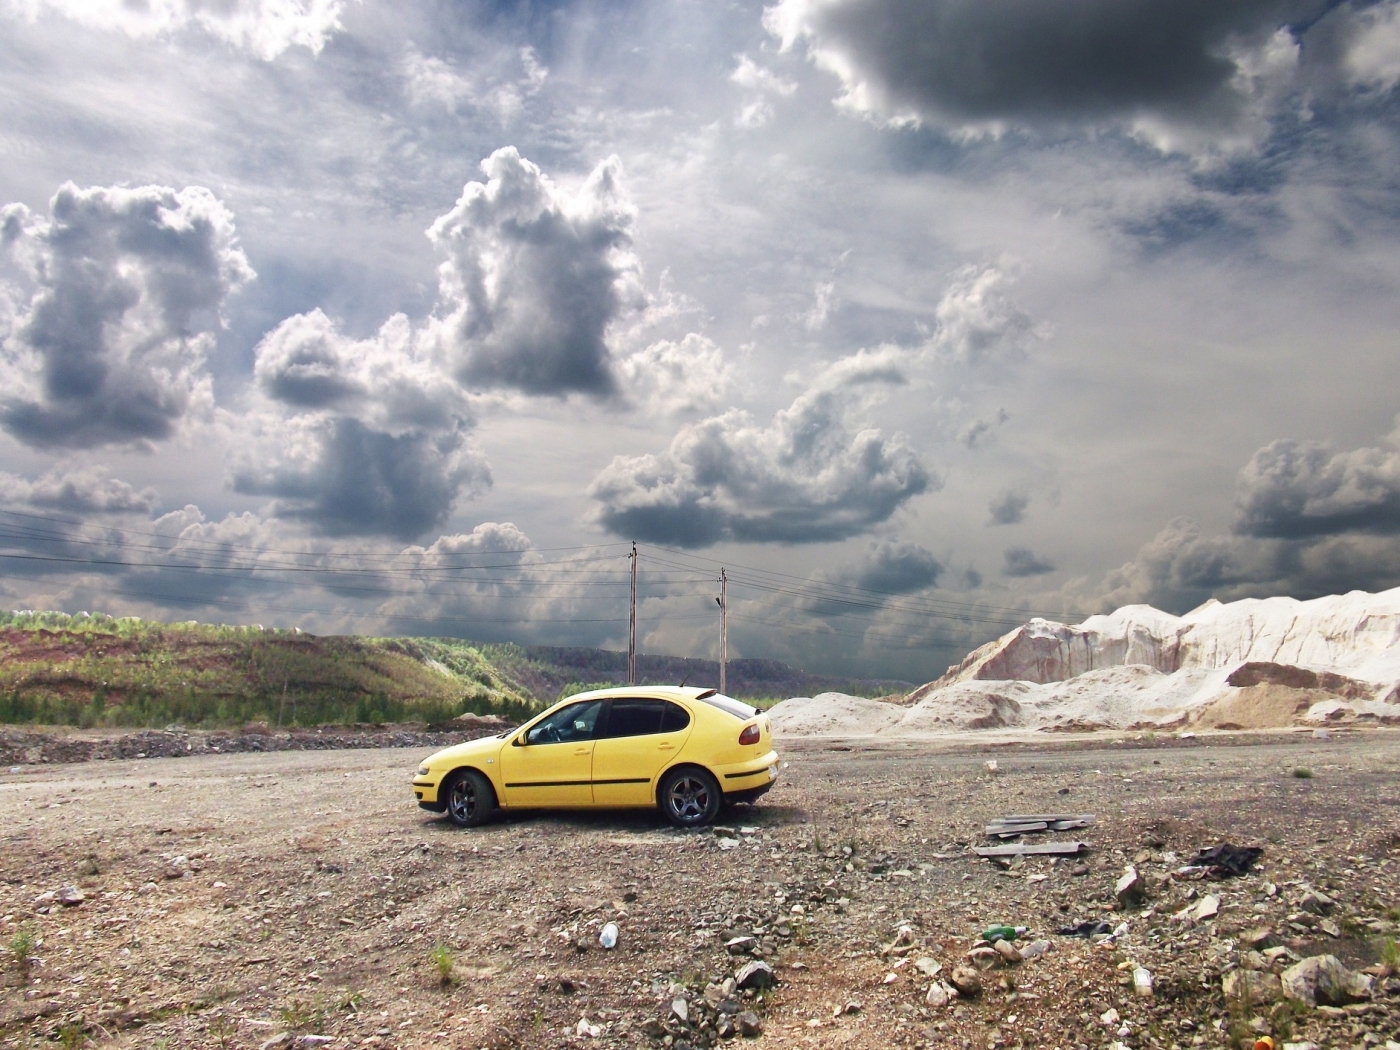 Download mobile wallpaper Transport, Landscape, Auto for free.